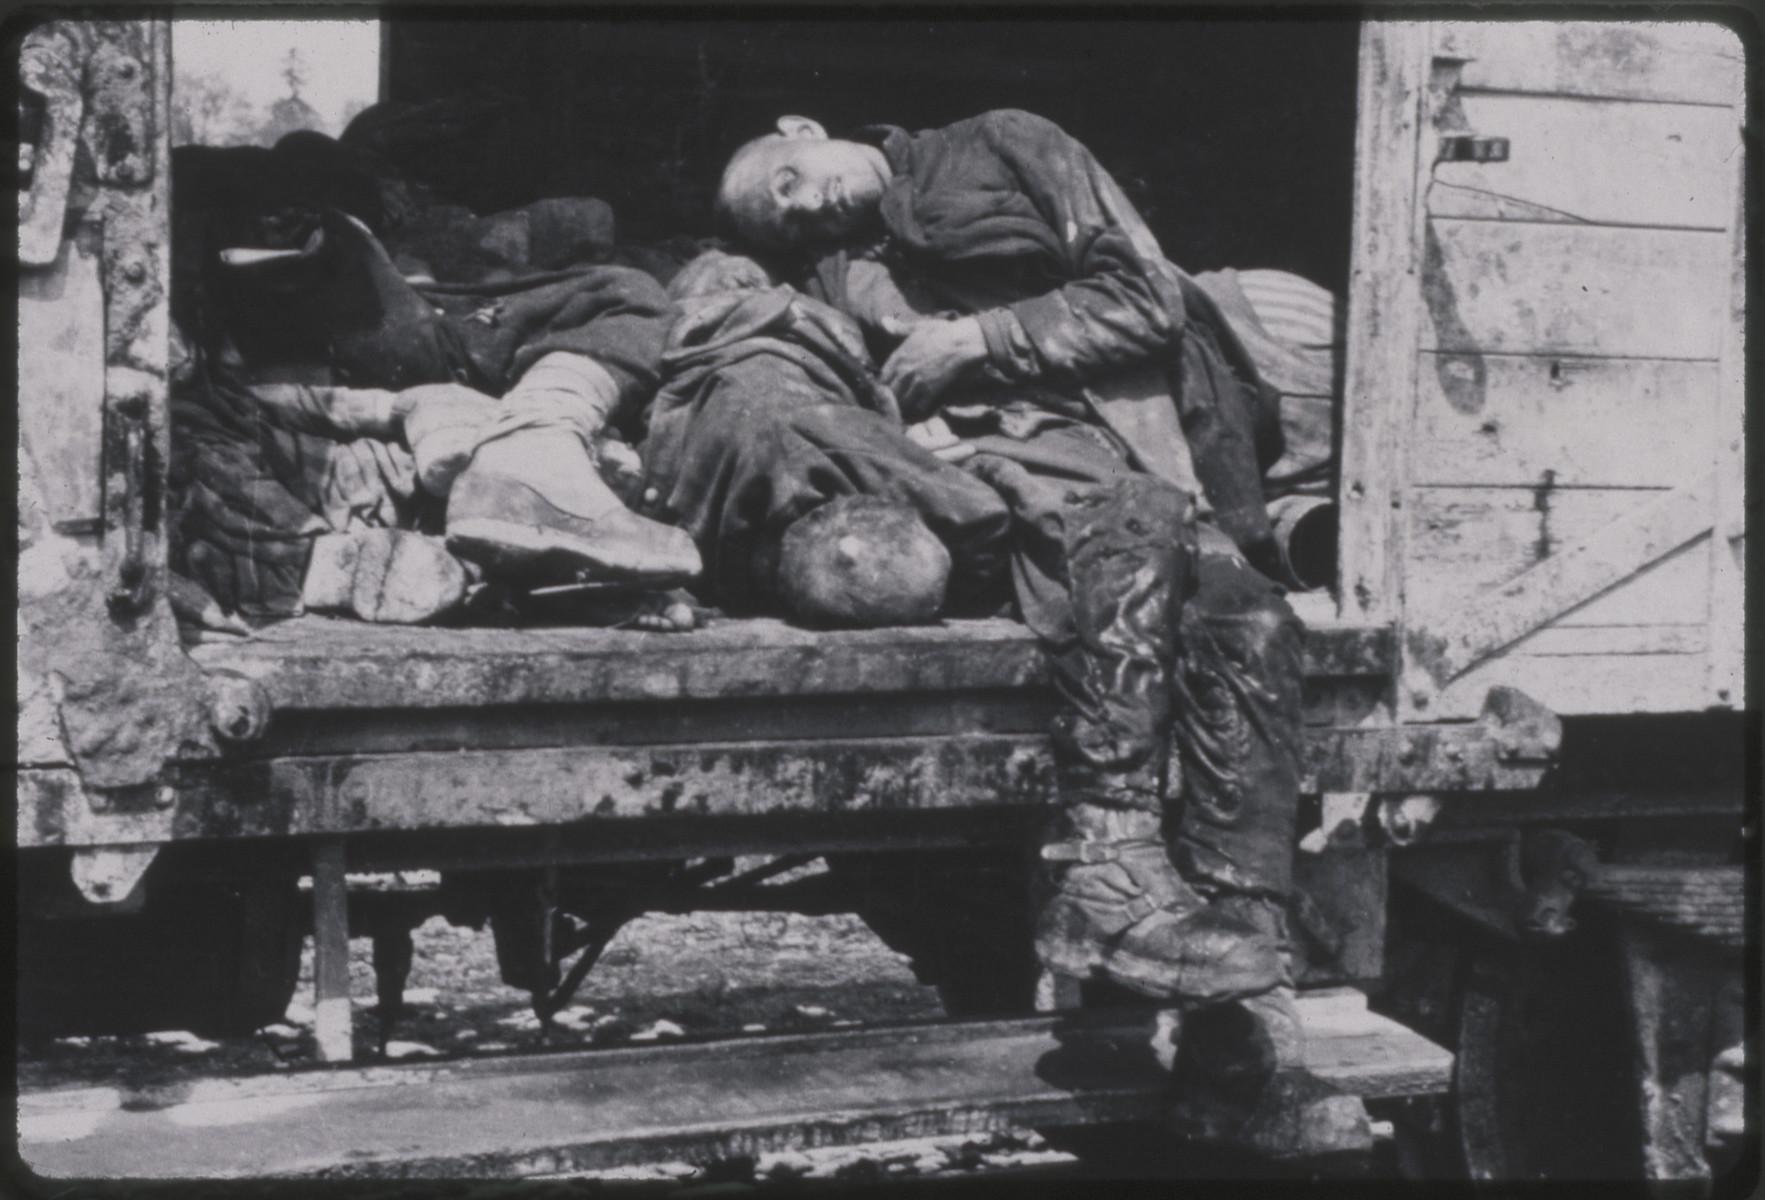 Close-up view of bodies on the Dachau death train.